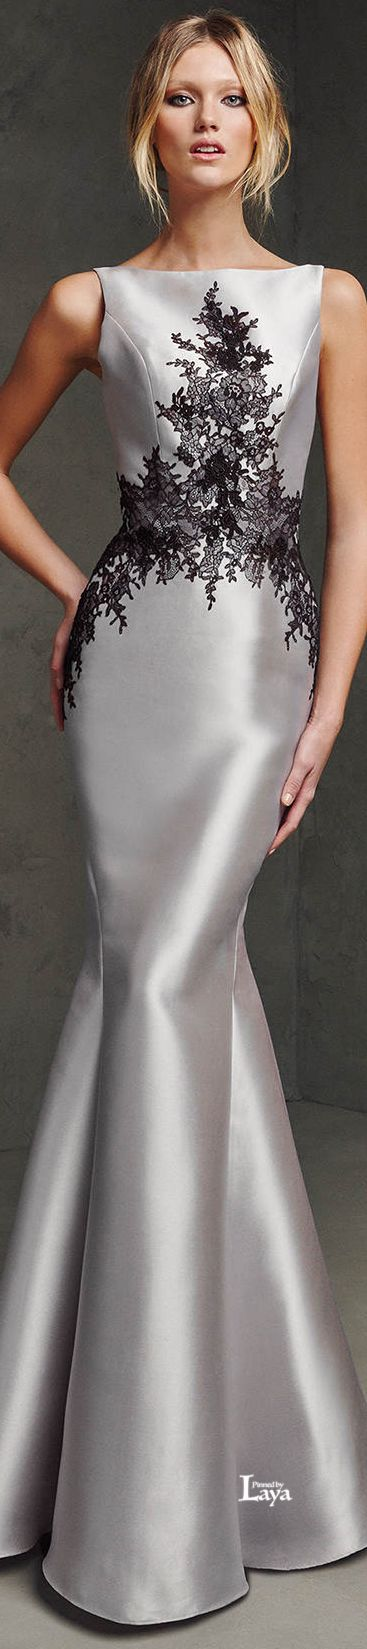 Pronovias 2016 EVENING Dresses   Jennifer Taylor Brianza Collection